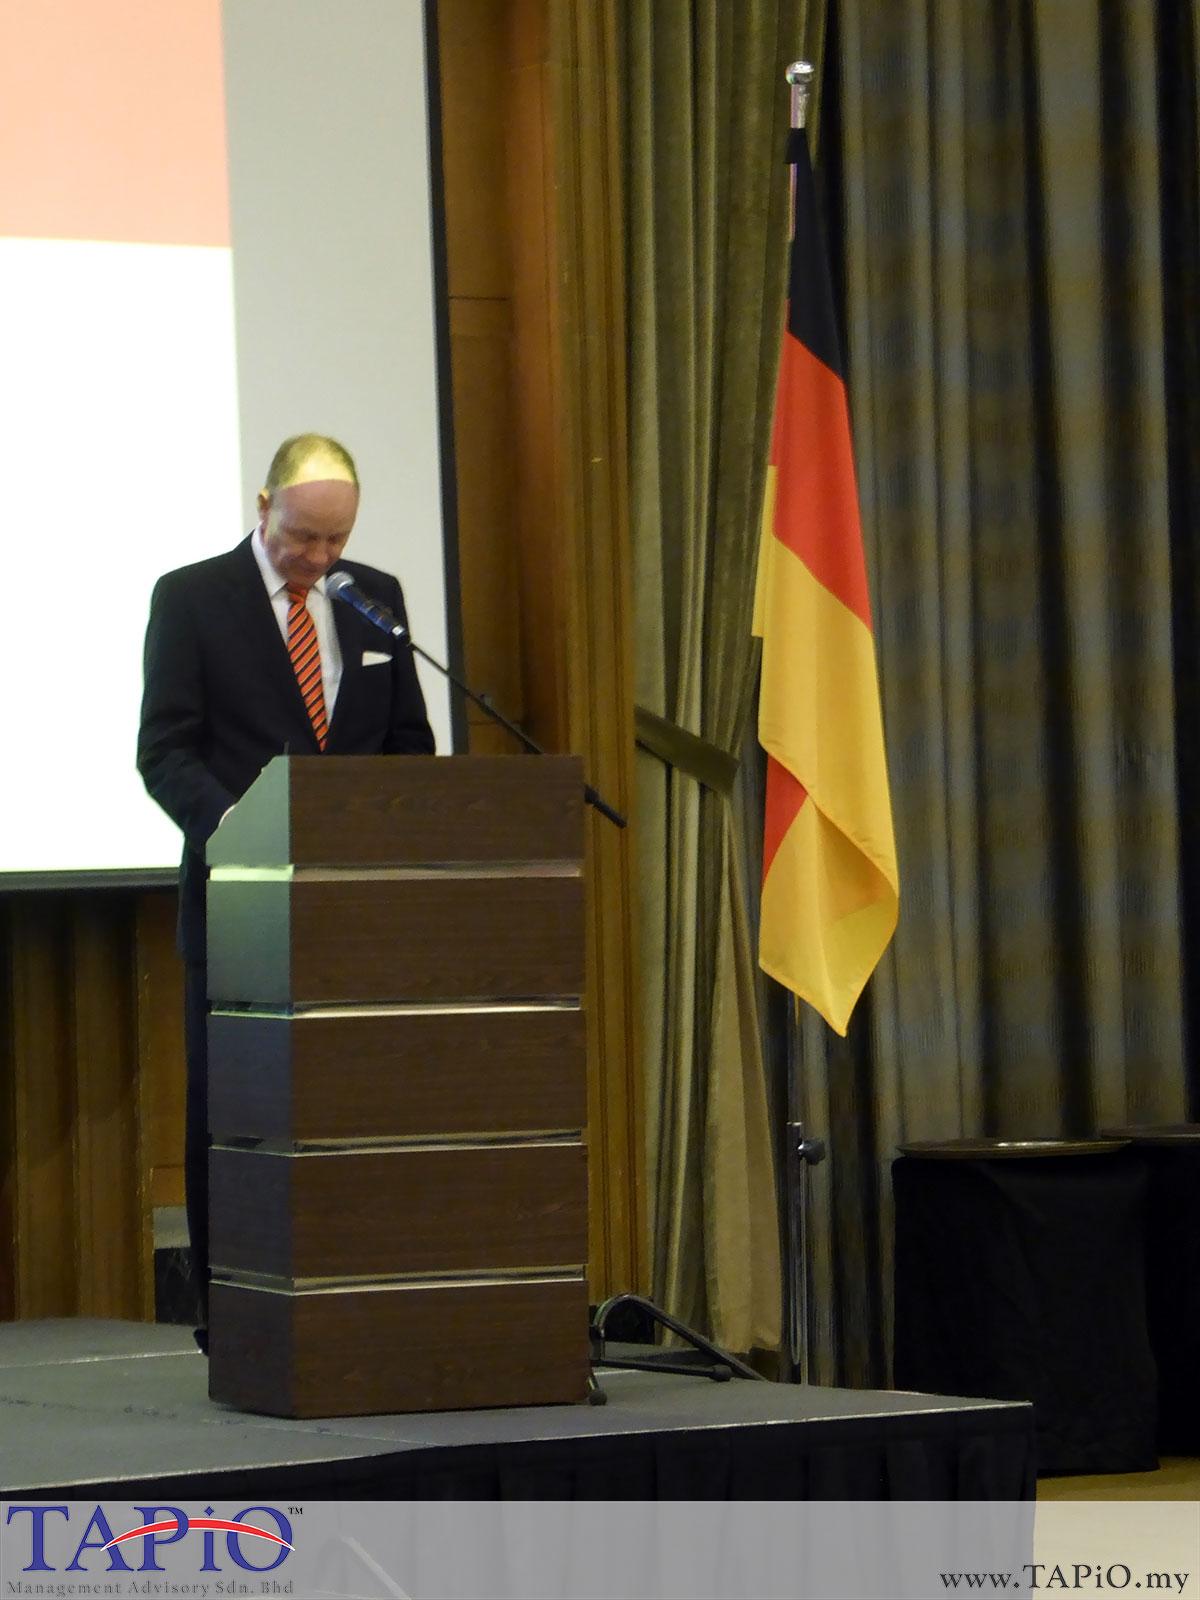 German Unity Day 2017 - 29